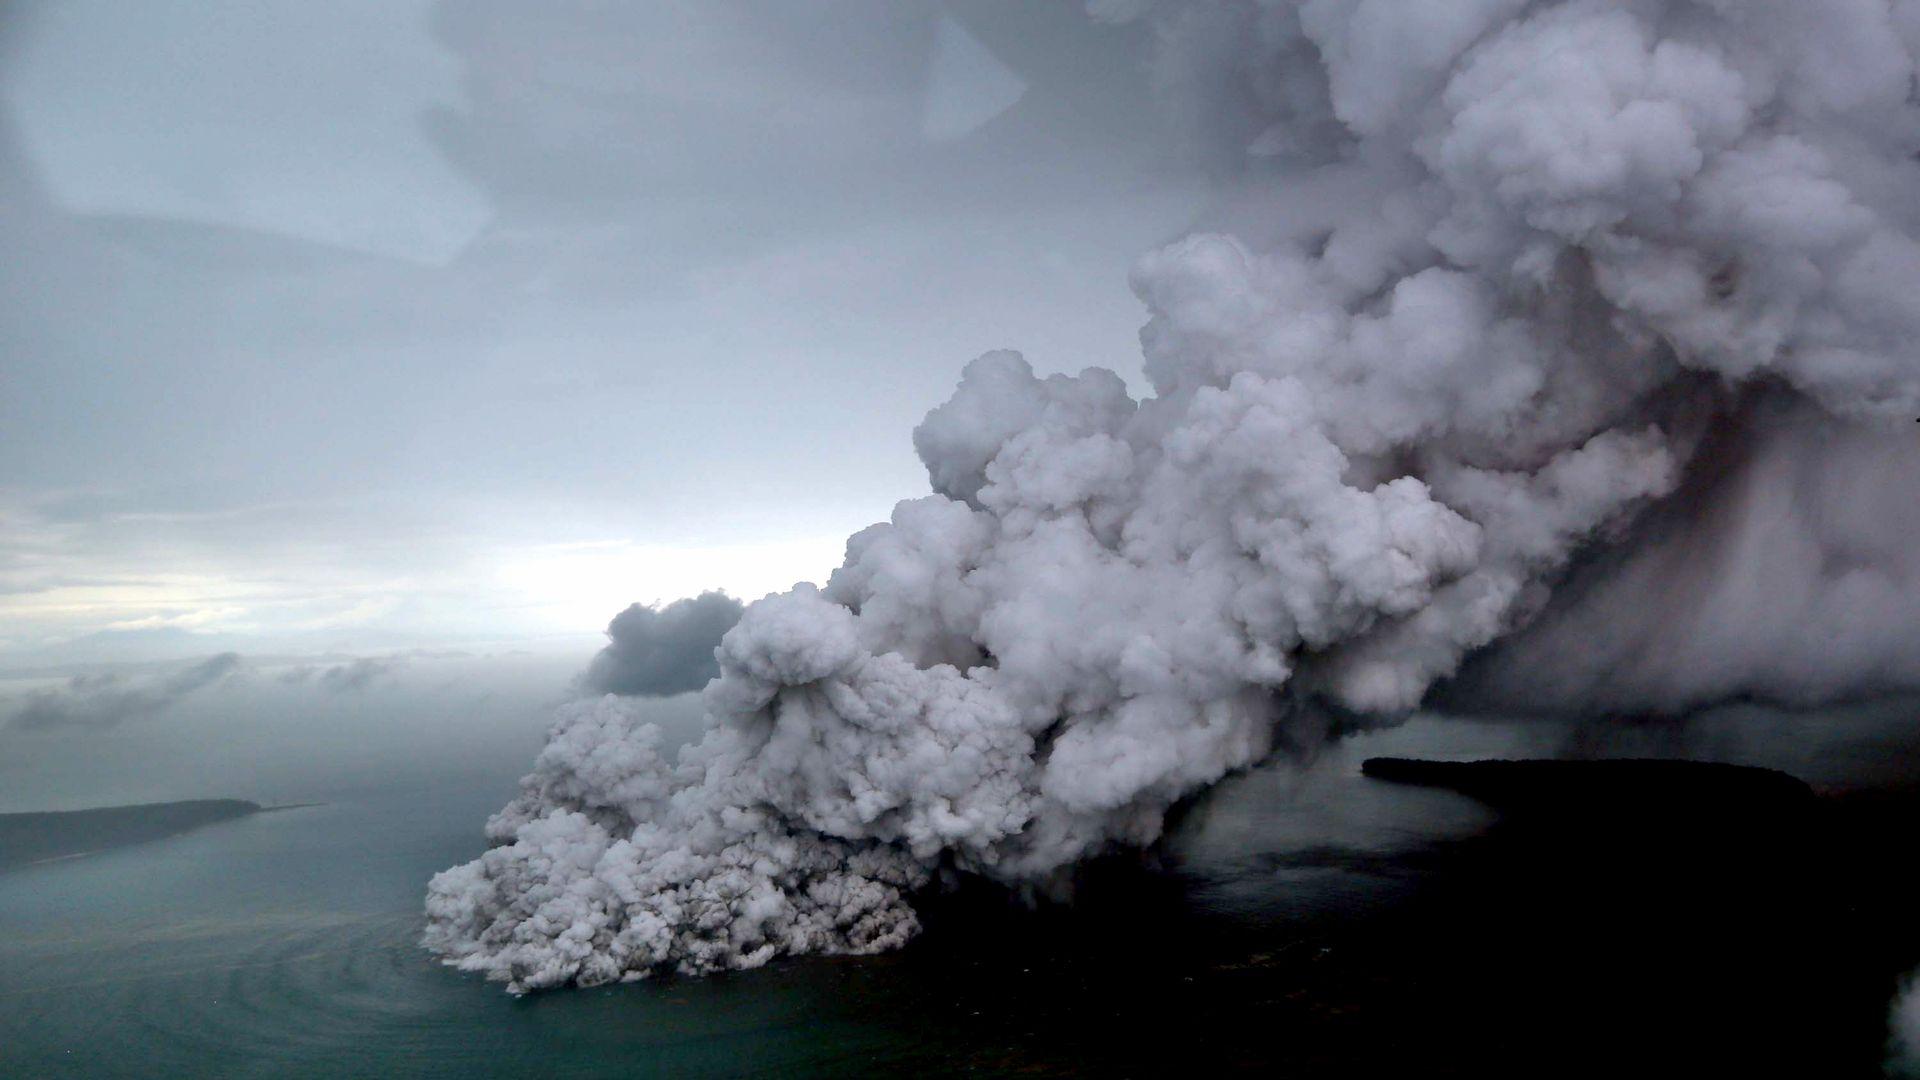 Smoke billowing from volcano eruption